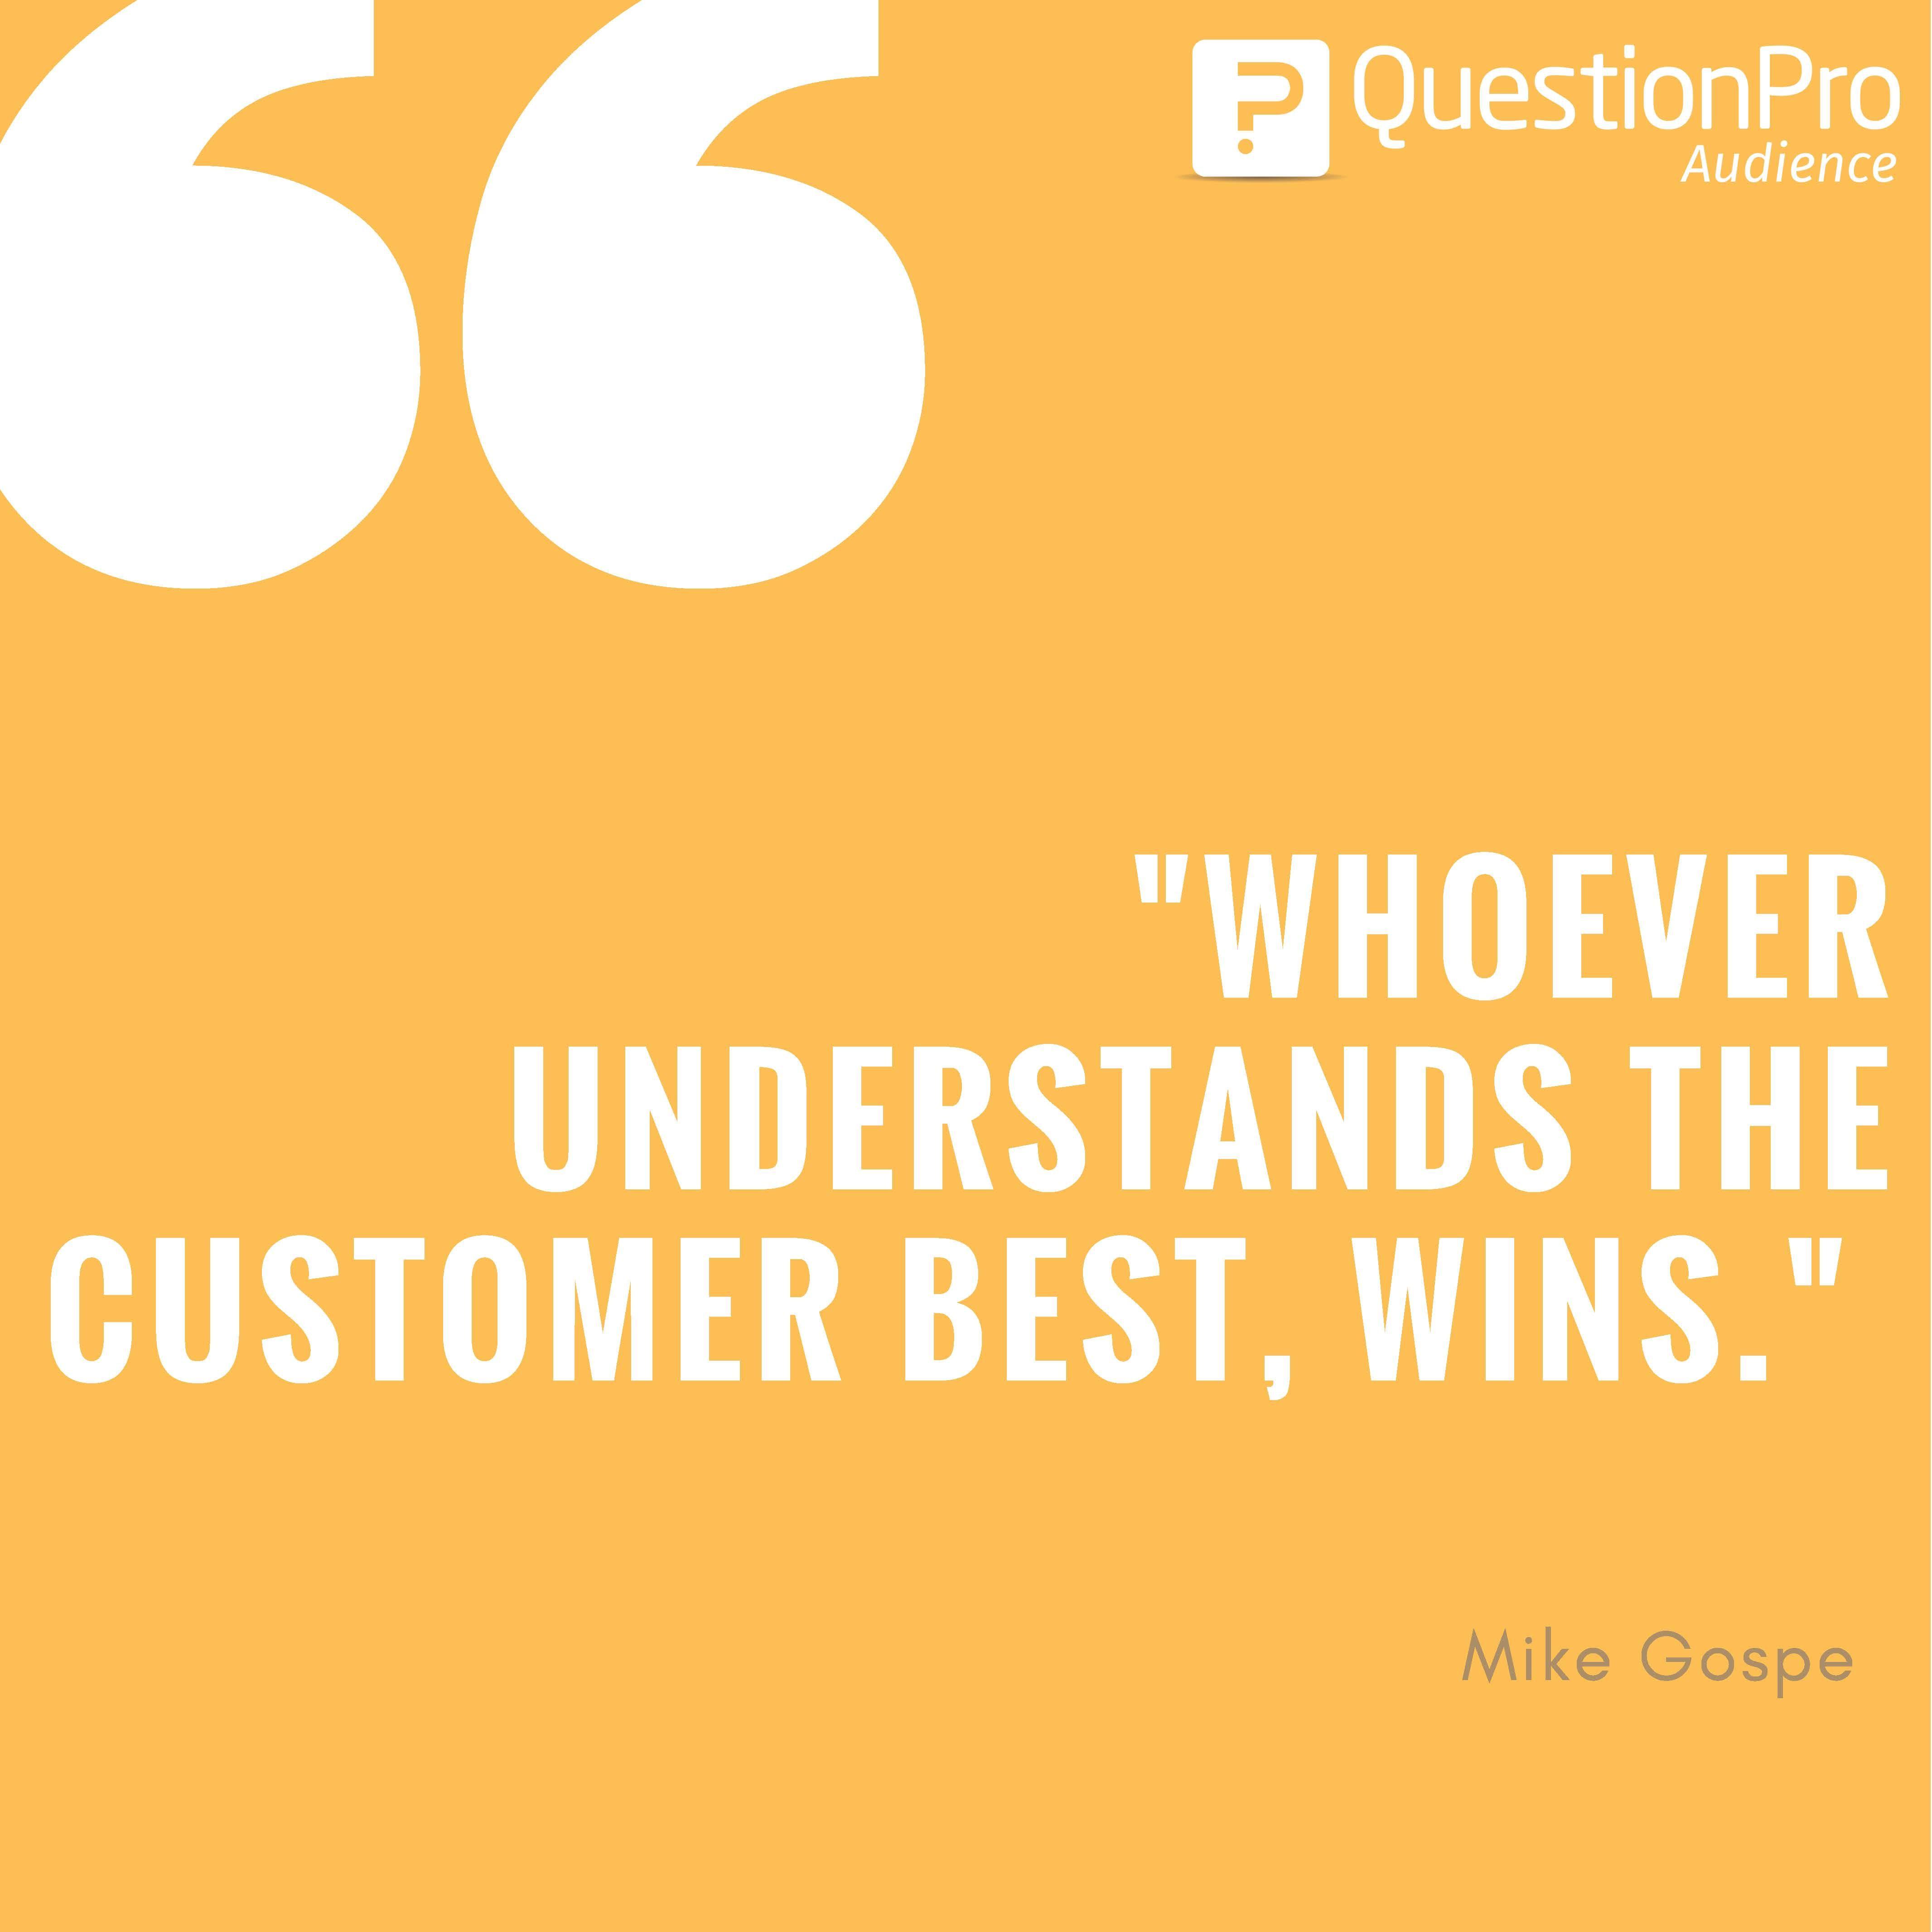 mikegospe marketing marketinghighground business